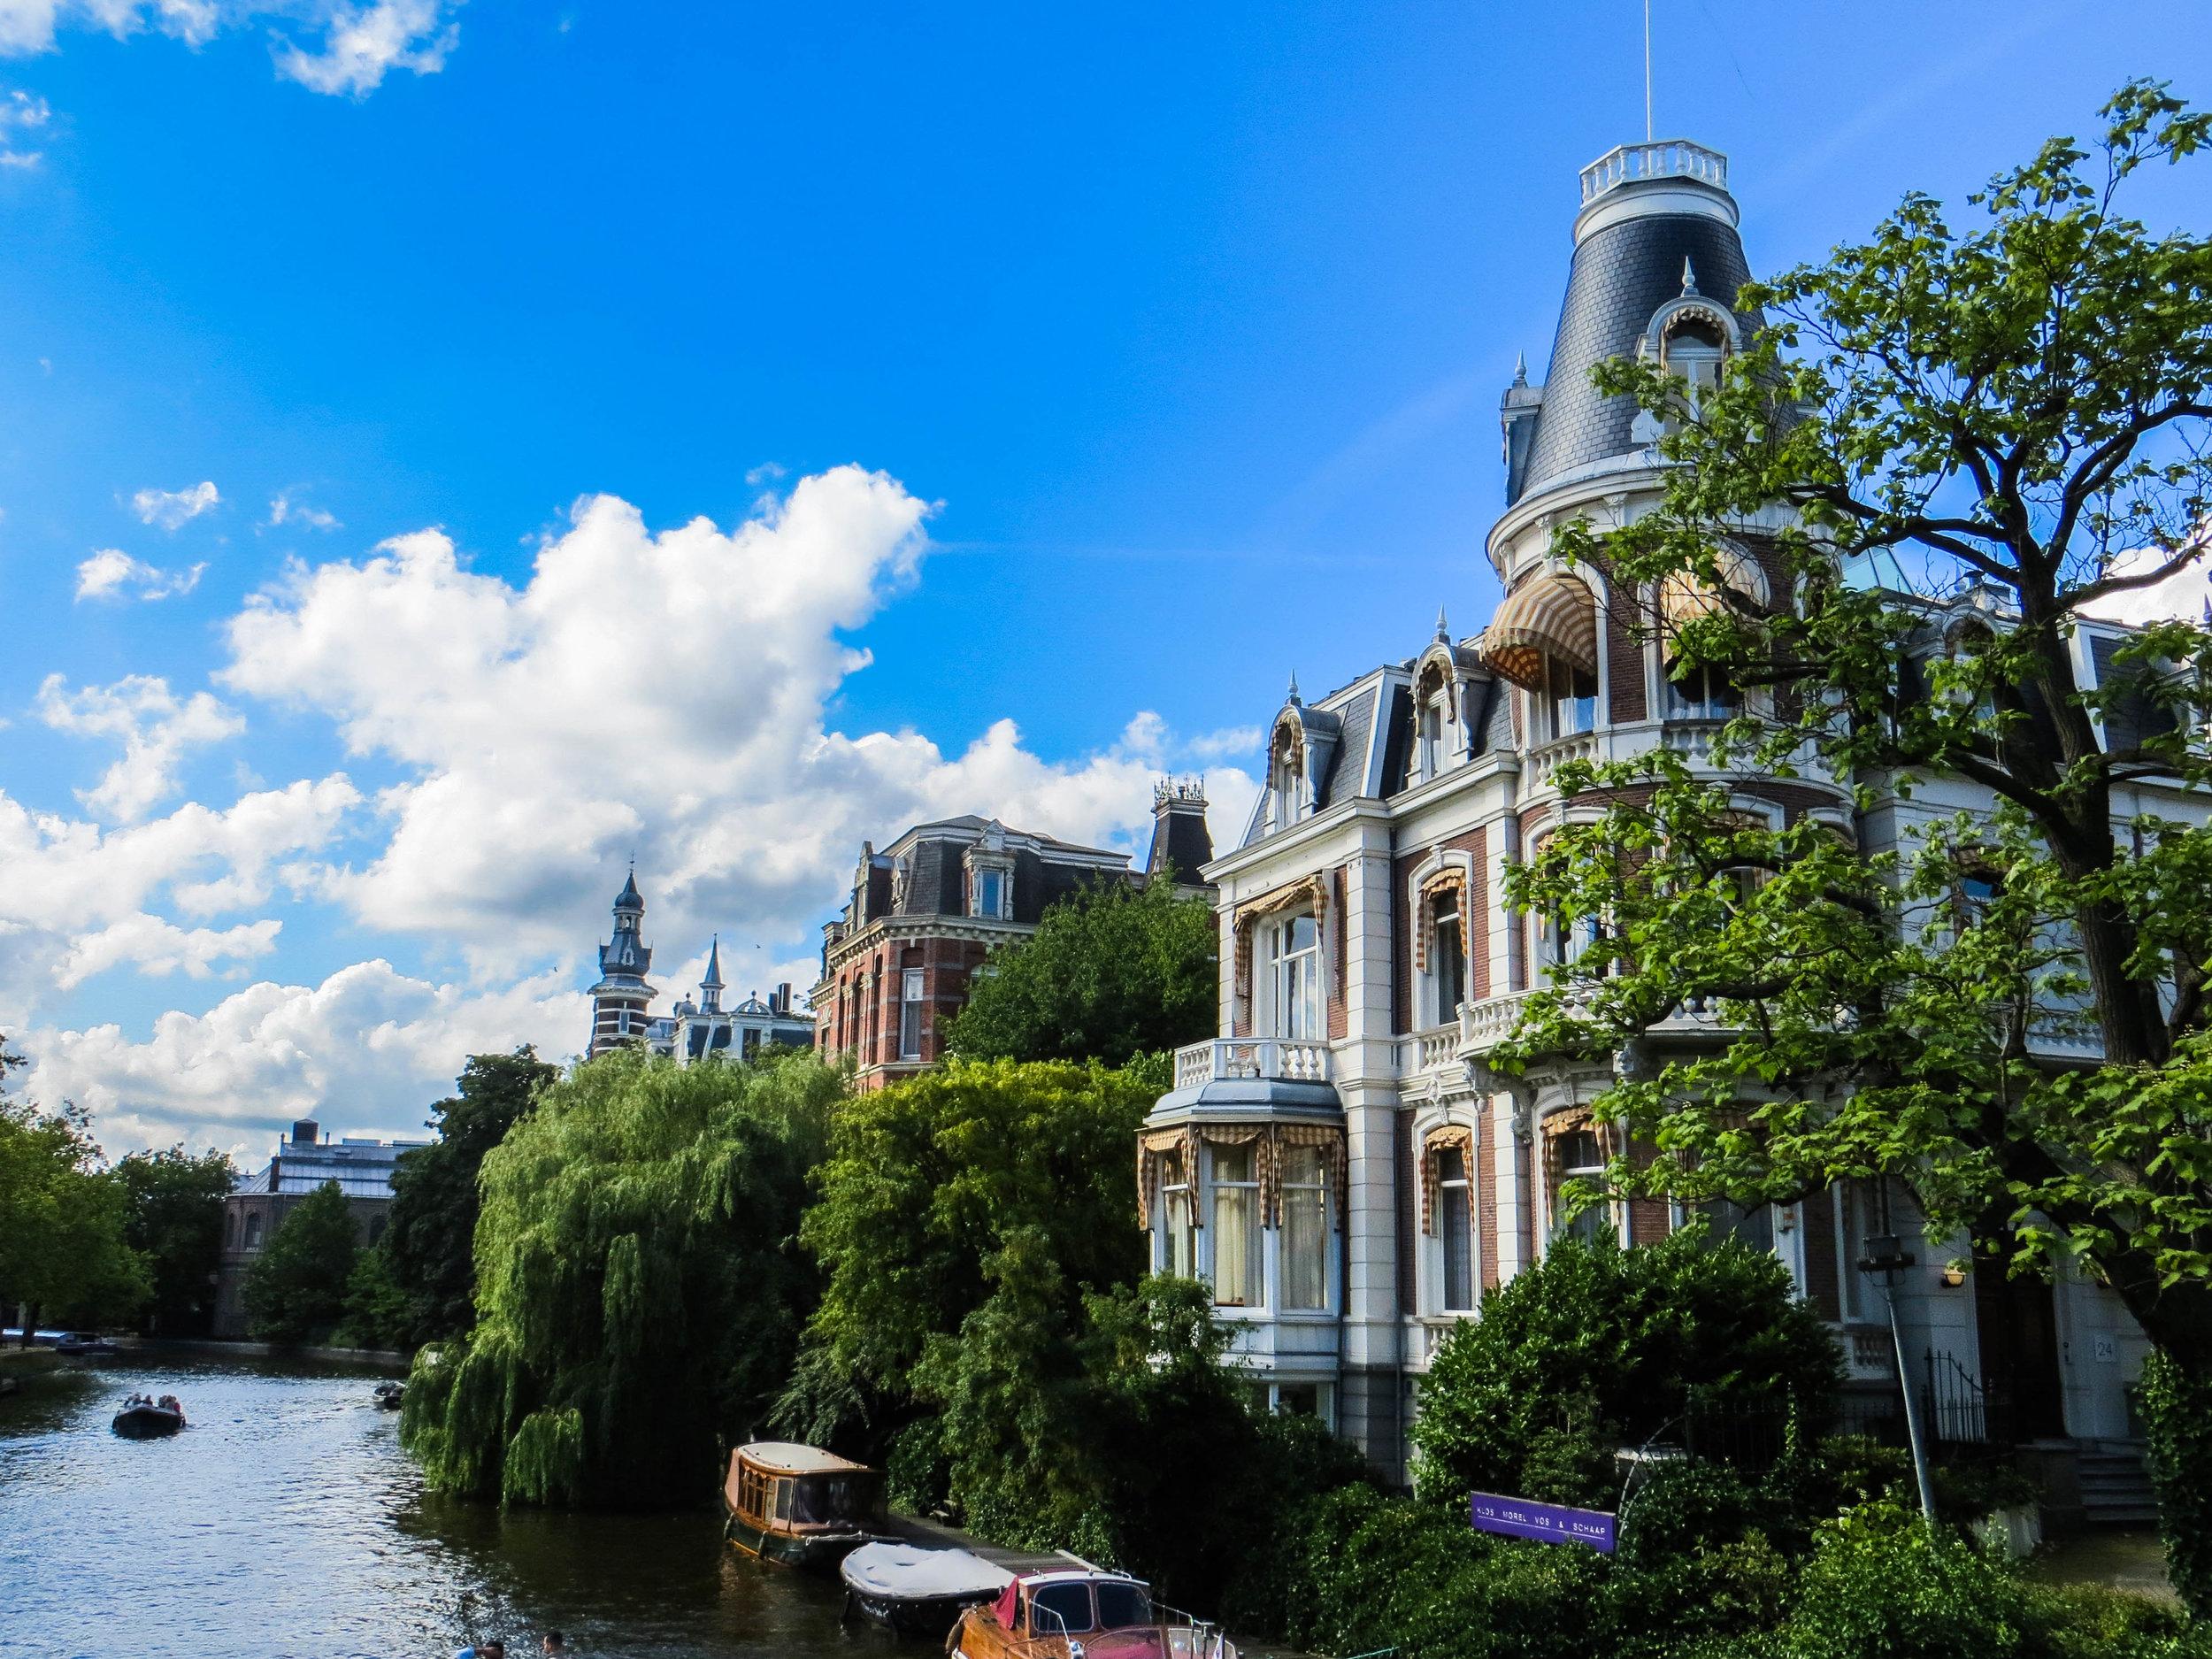 amsterdam-netherlands-street-photography-30.jpg